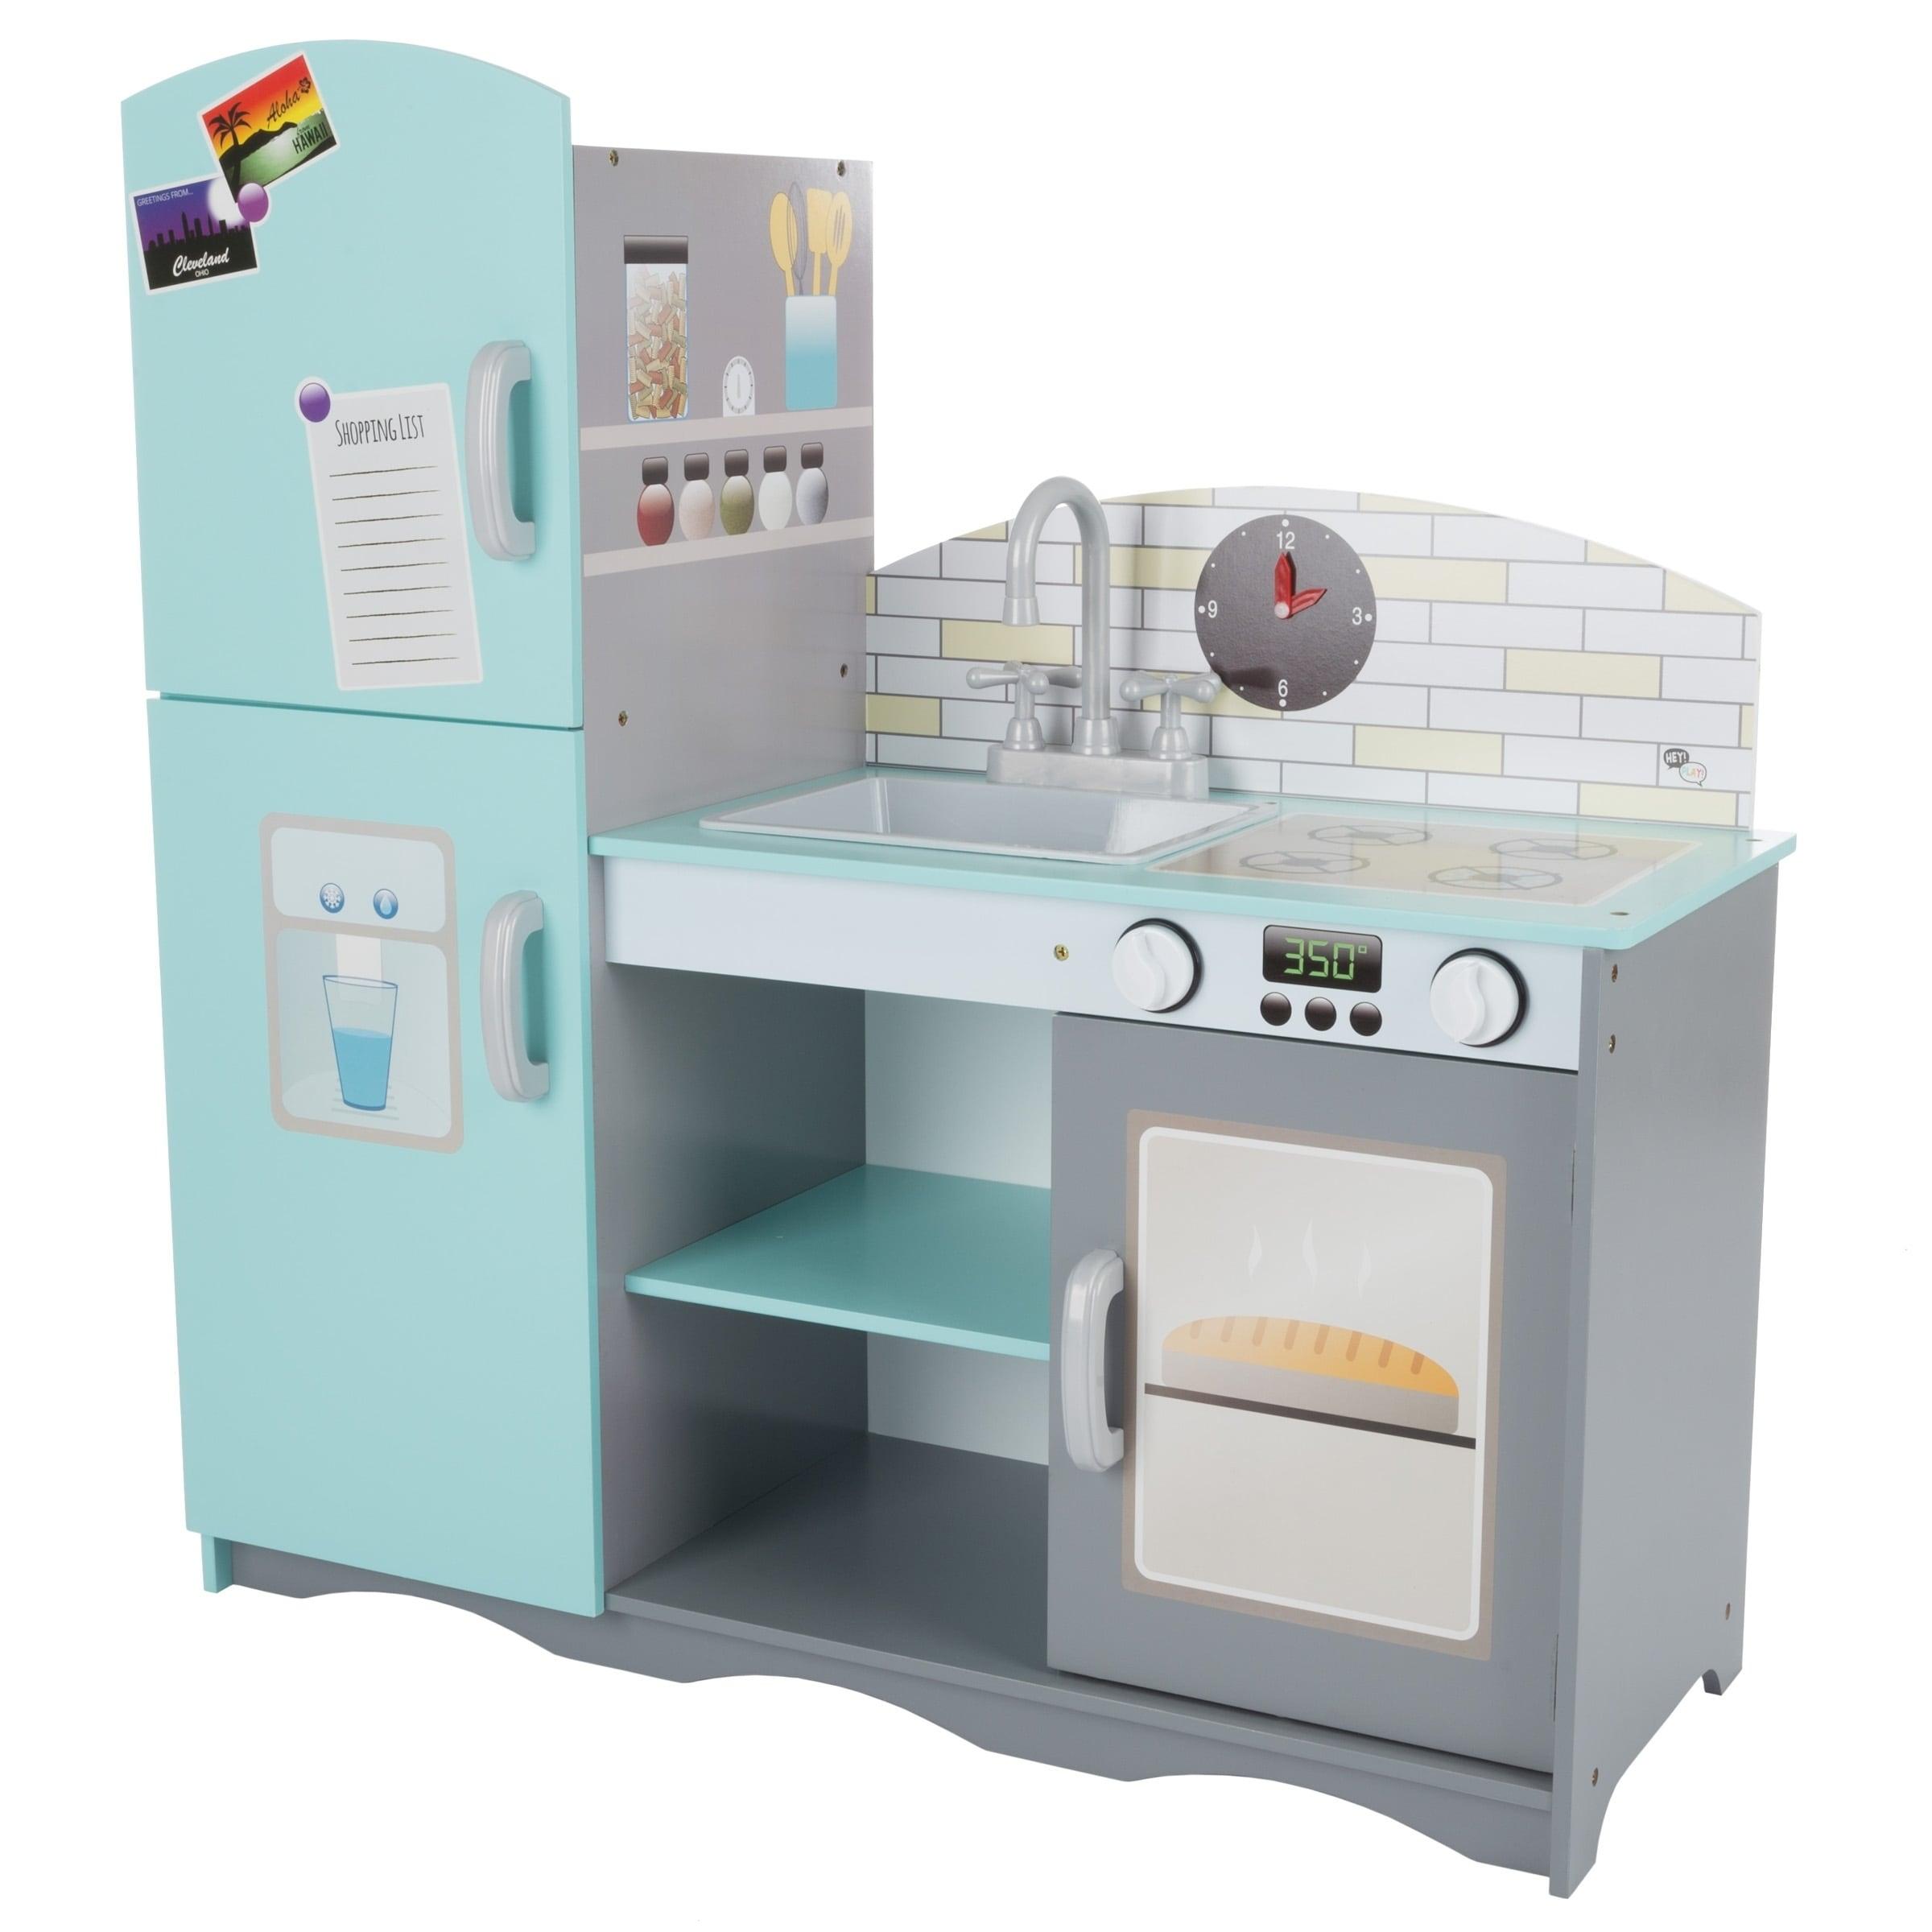 Shop Kids Toy Kitchen Set- Fun Pretend Play Home Kitchen Playset ...